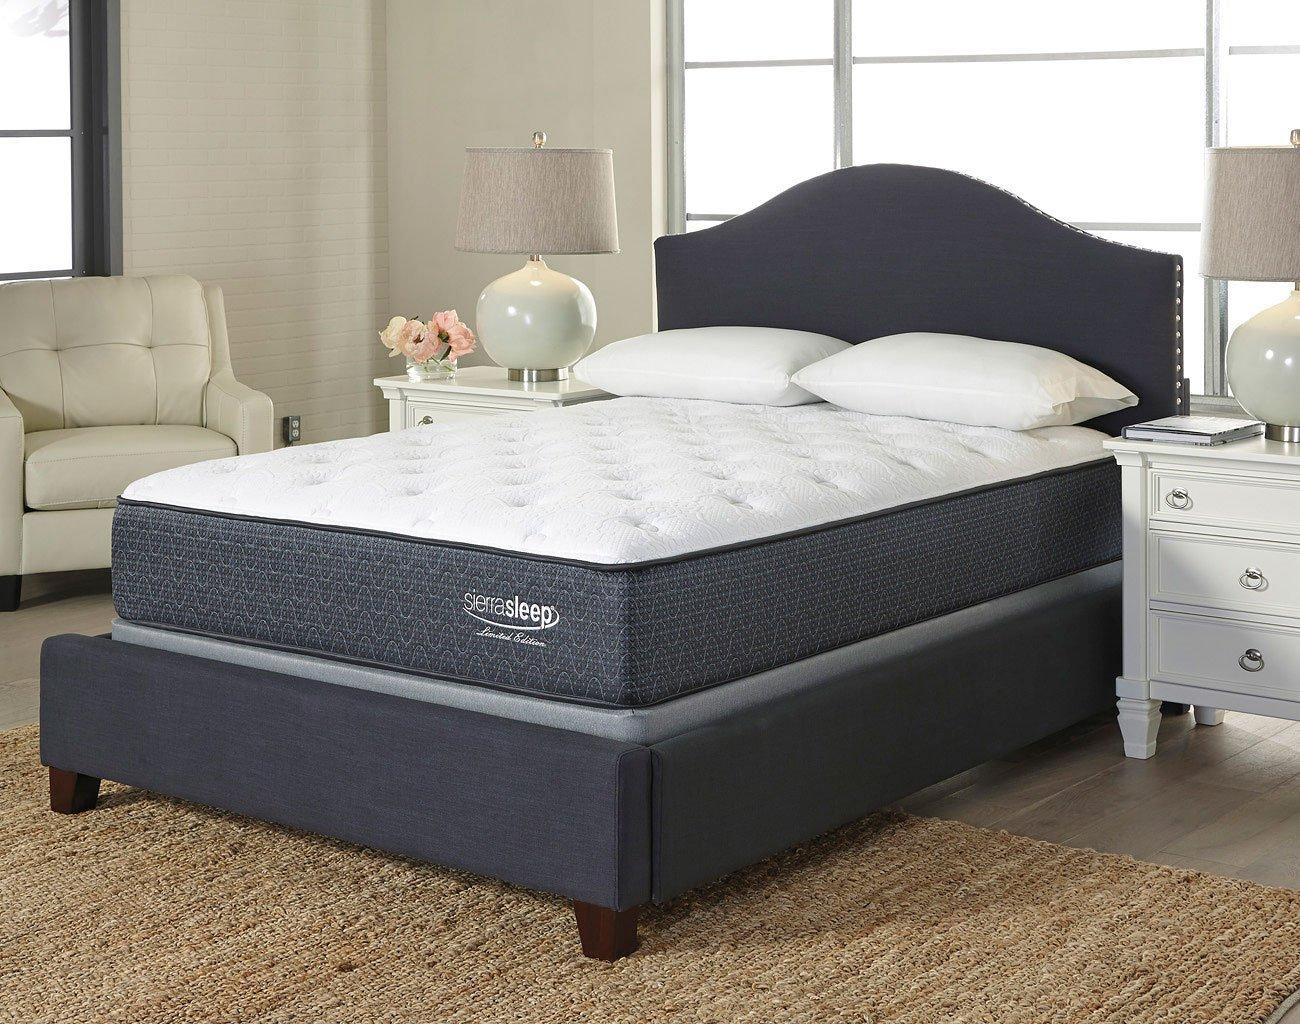 Limited Edition Plush Mattress Sierra Sleep Furniture Cart